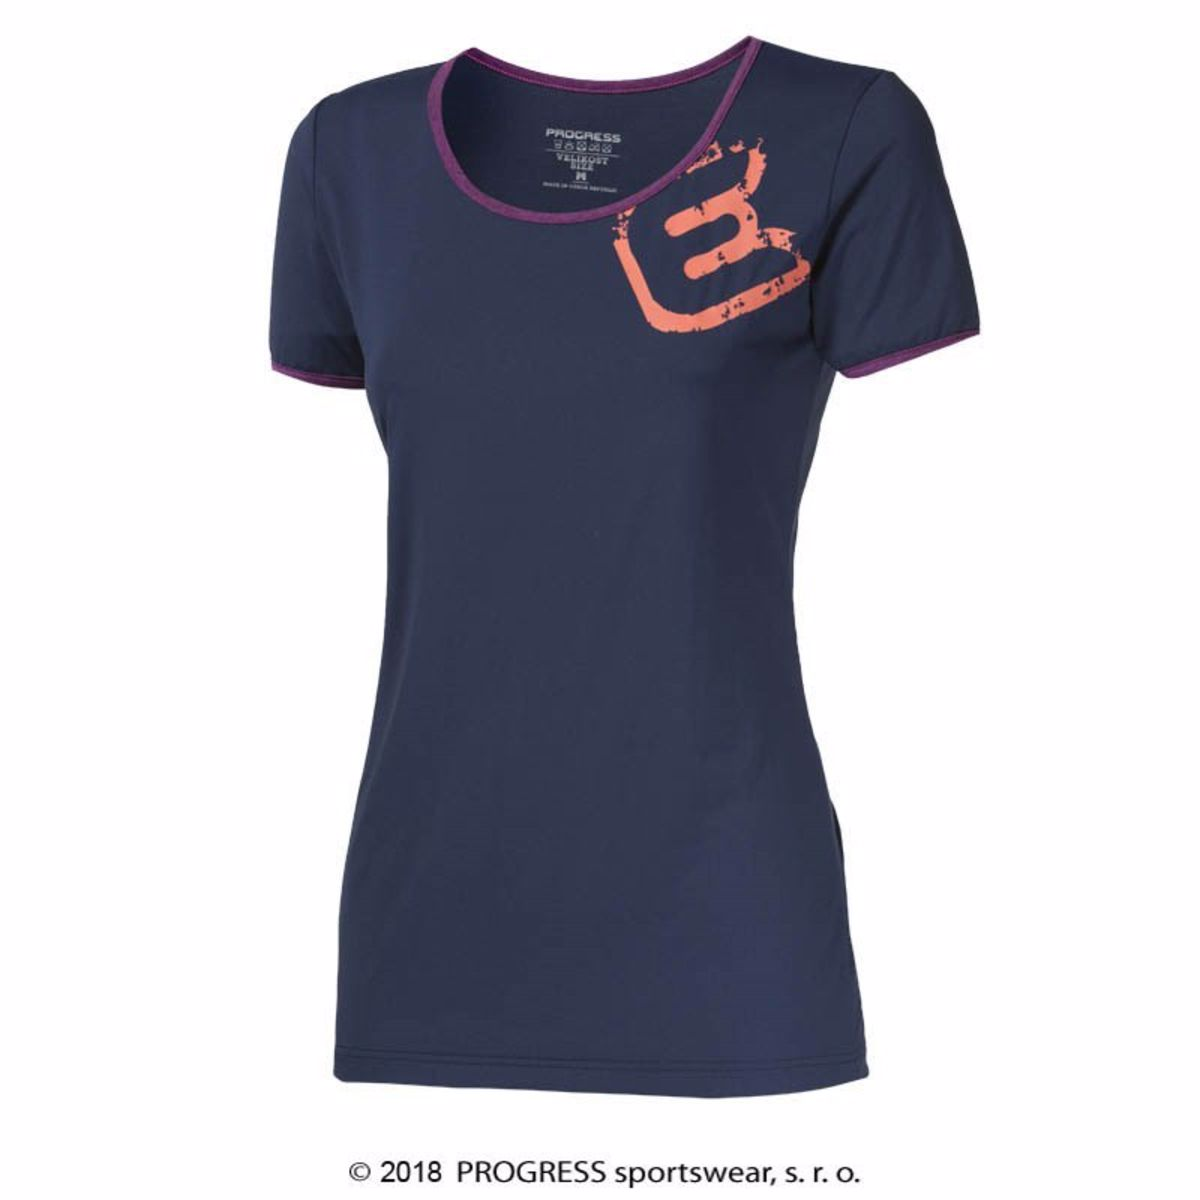 96bc51c937ebf Progress TR IMOLA dámske športové tričko